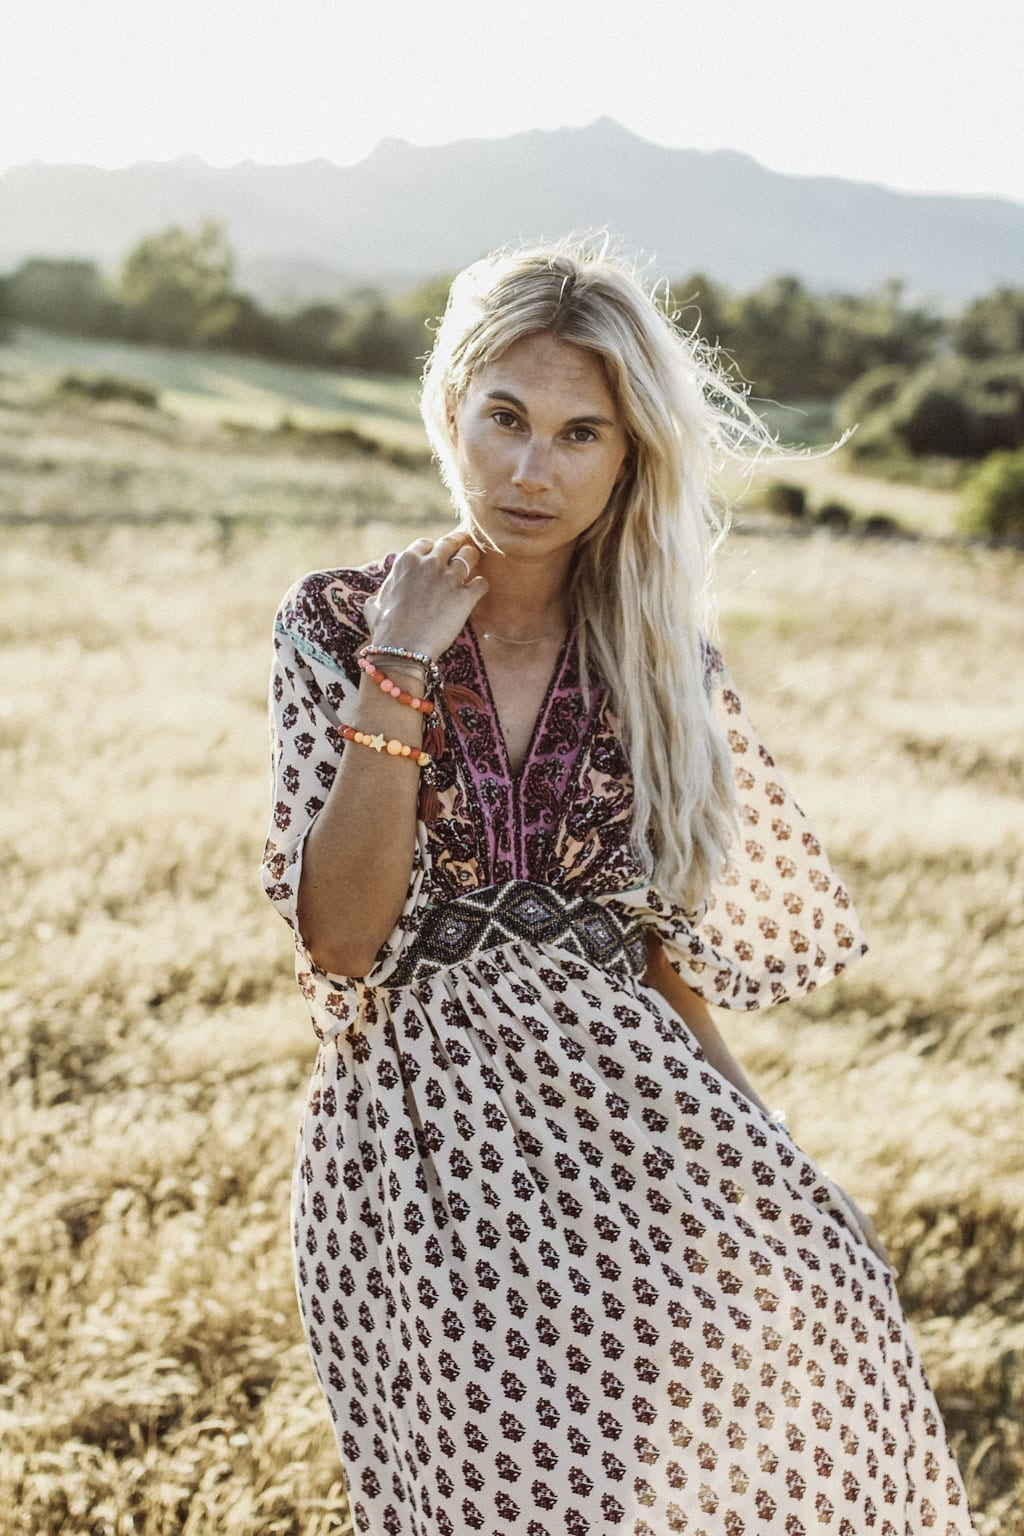 CK-1606_Sardinien-Sardegna-Sardinia-Italy-Italia-Fashion-Blog-Sun-Down-Dress-Blonde-Karin-Kaswurm-9824